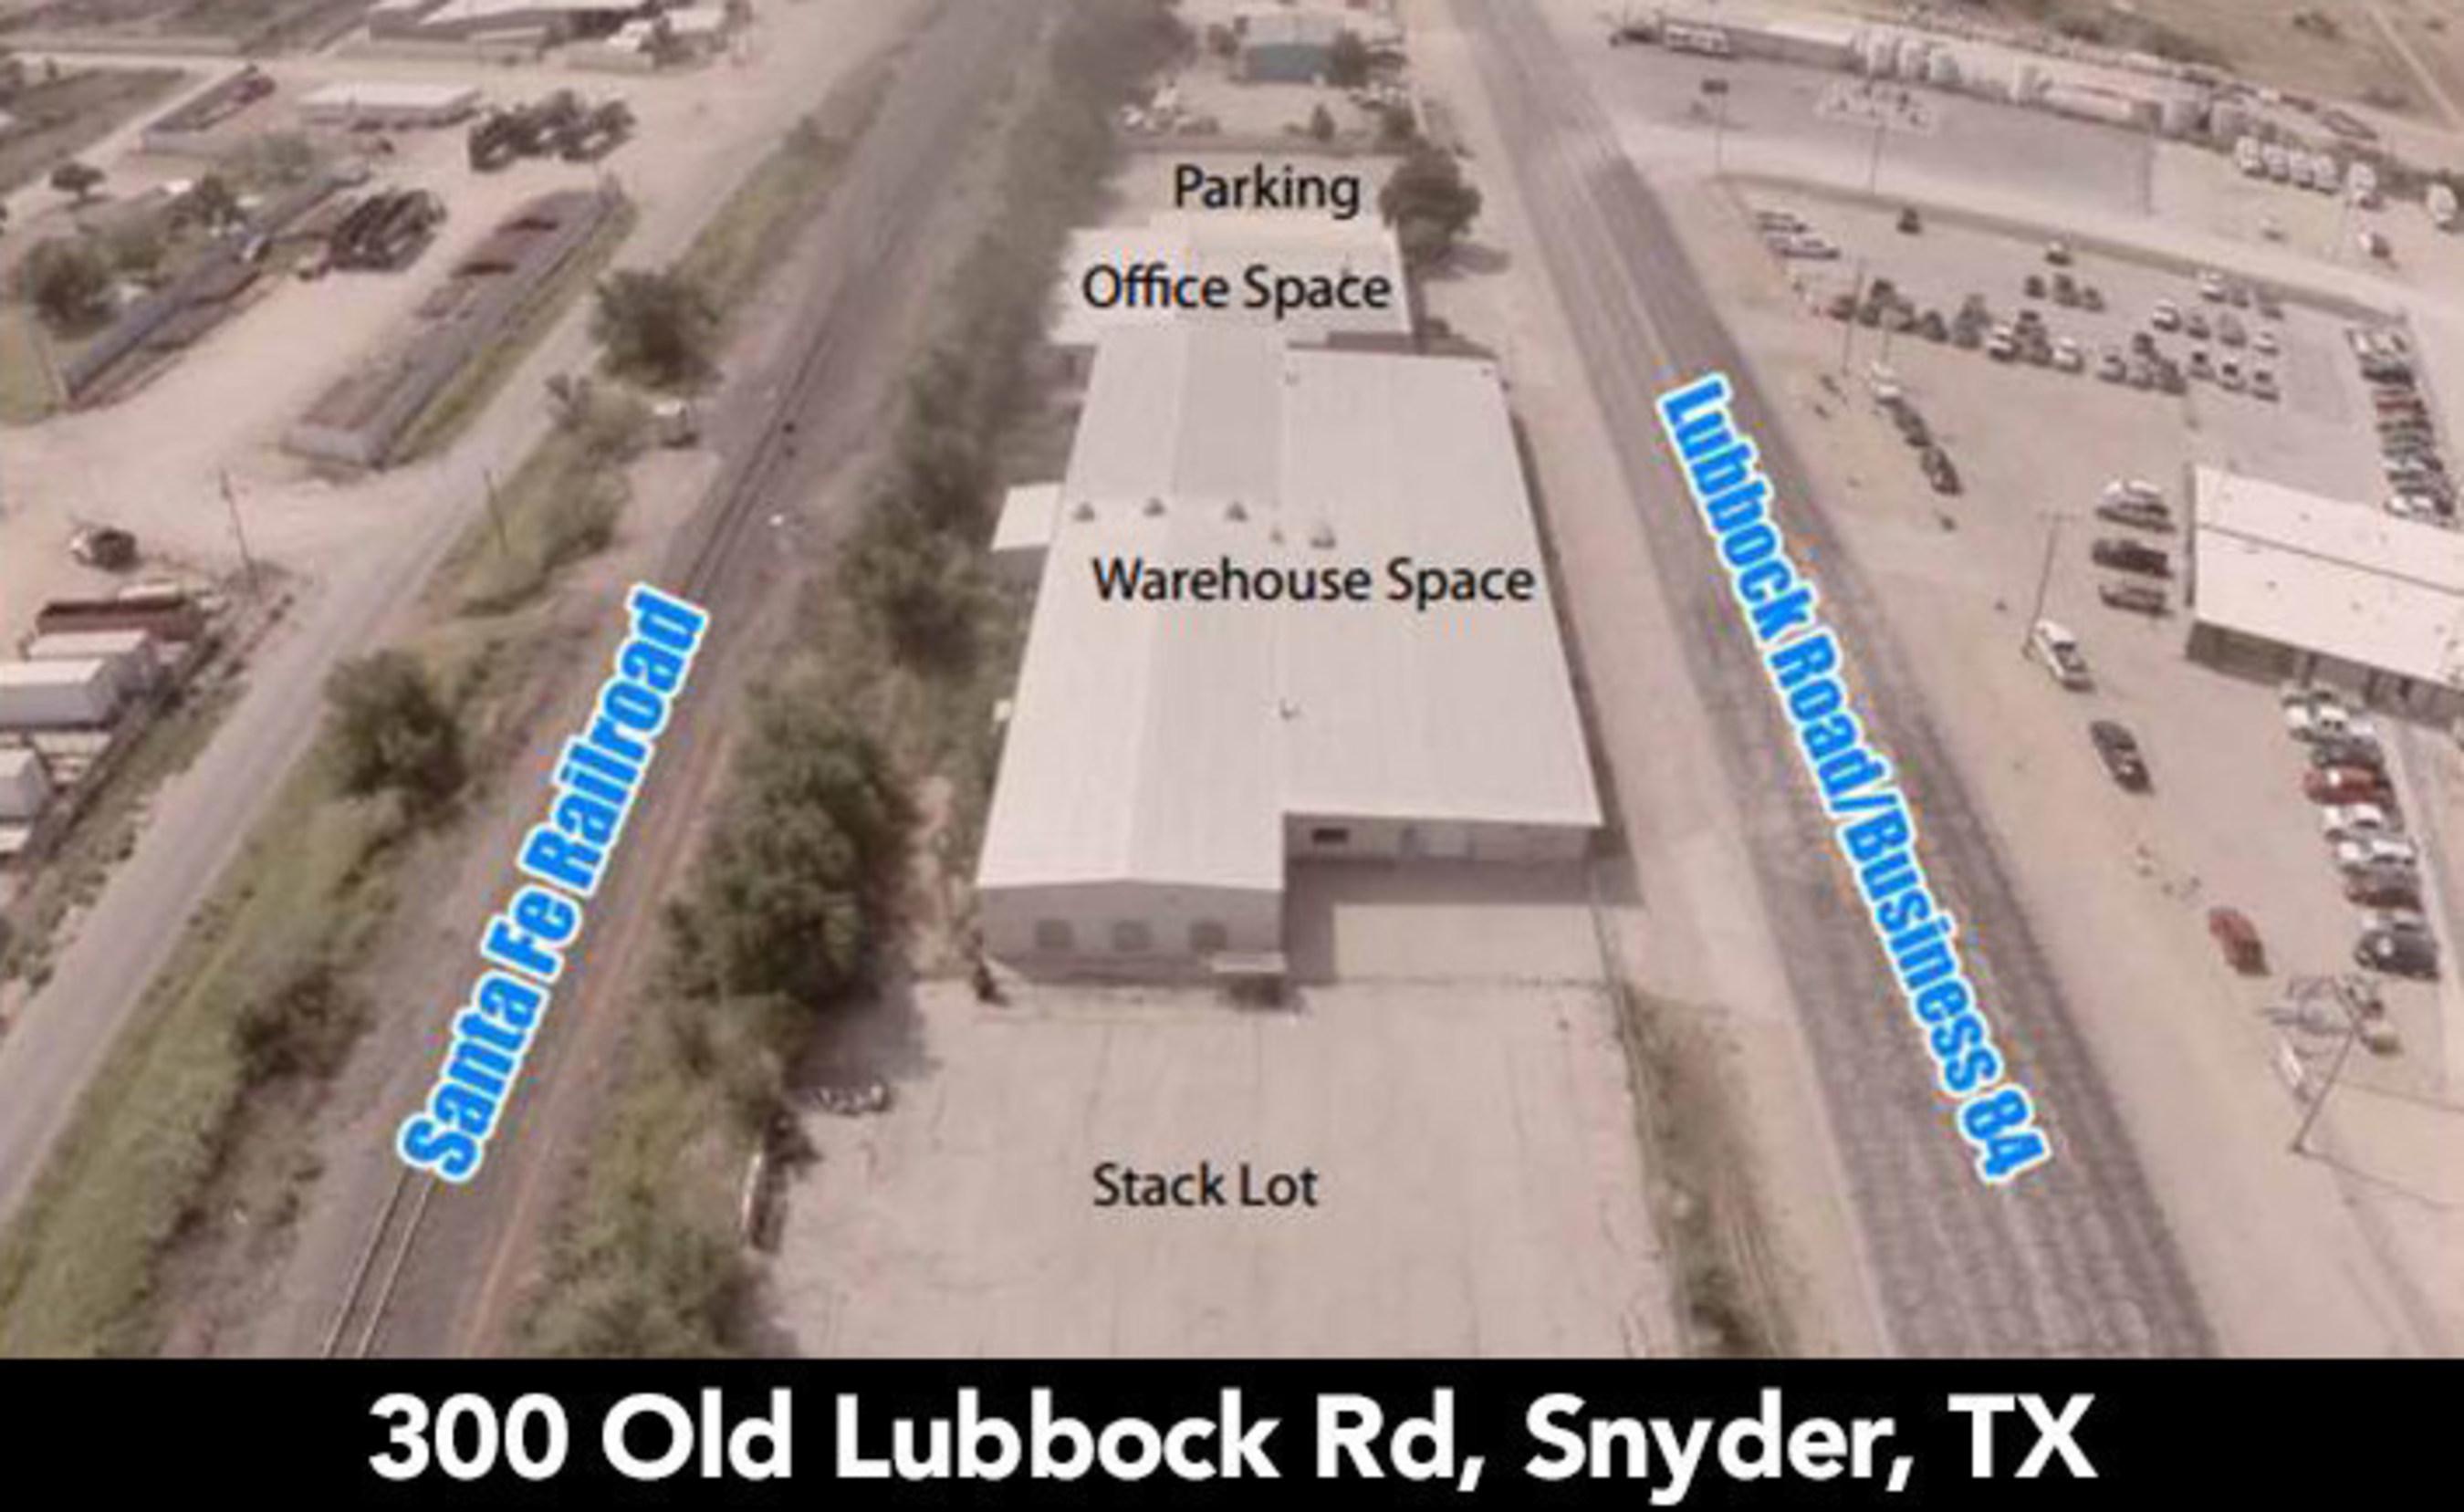 Snyder, TX Industrial Complex Auction